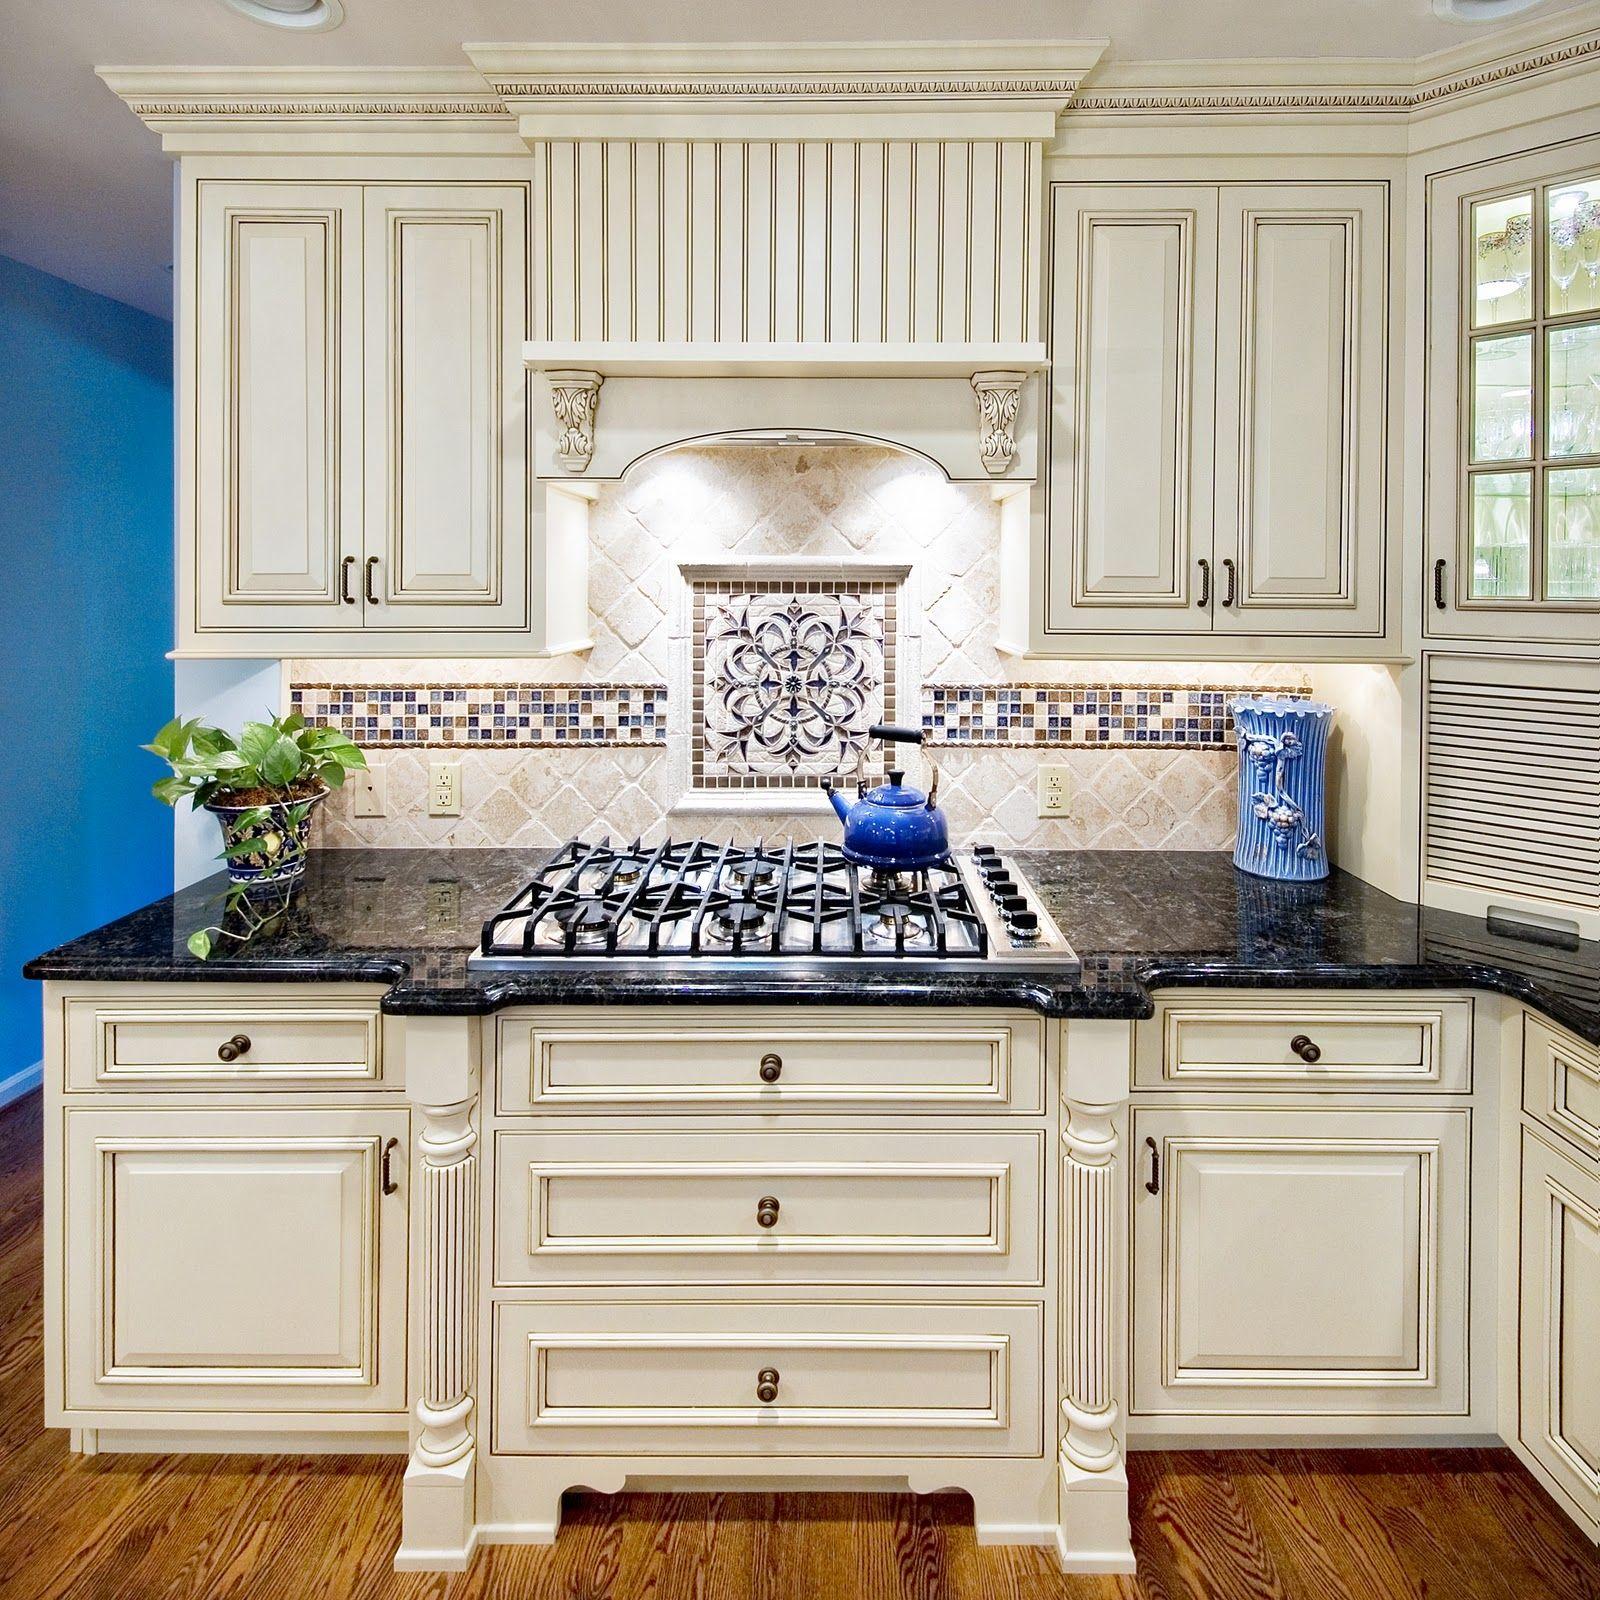 Ivory Cream White Kitchen Cabinets | kitchentastic | Pinterest ...